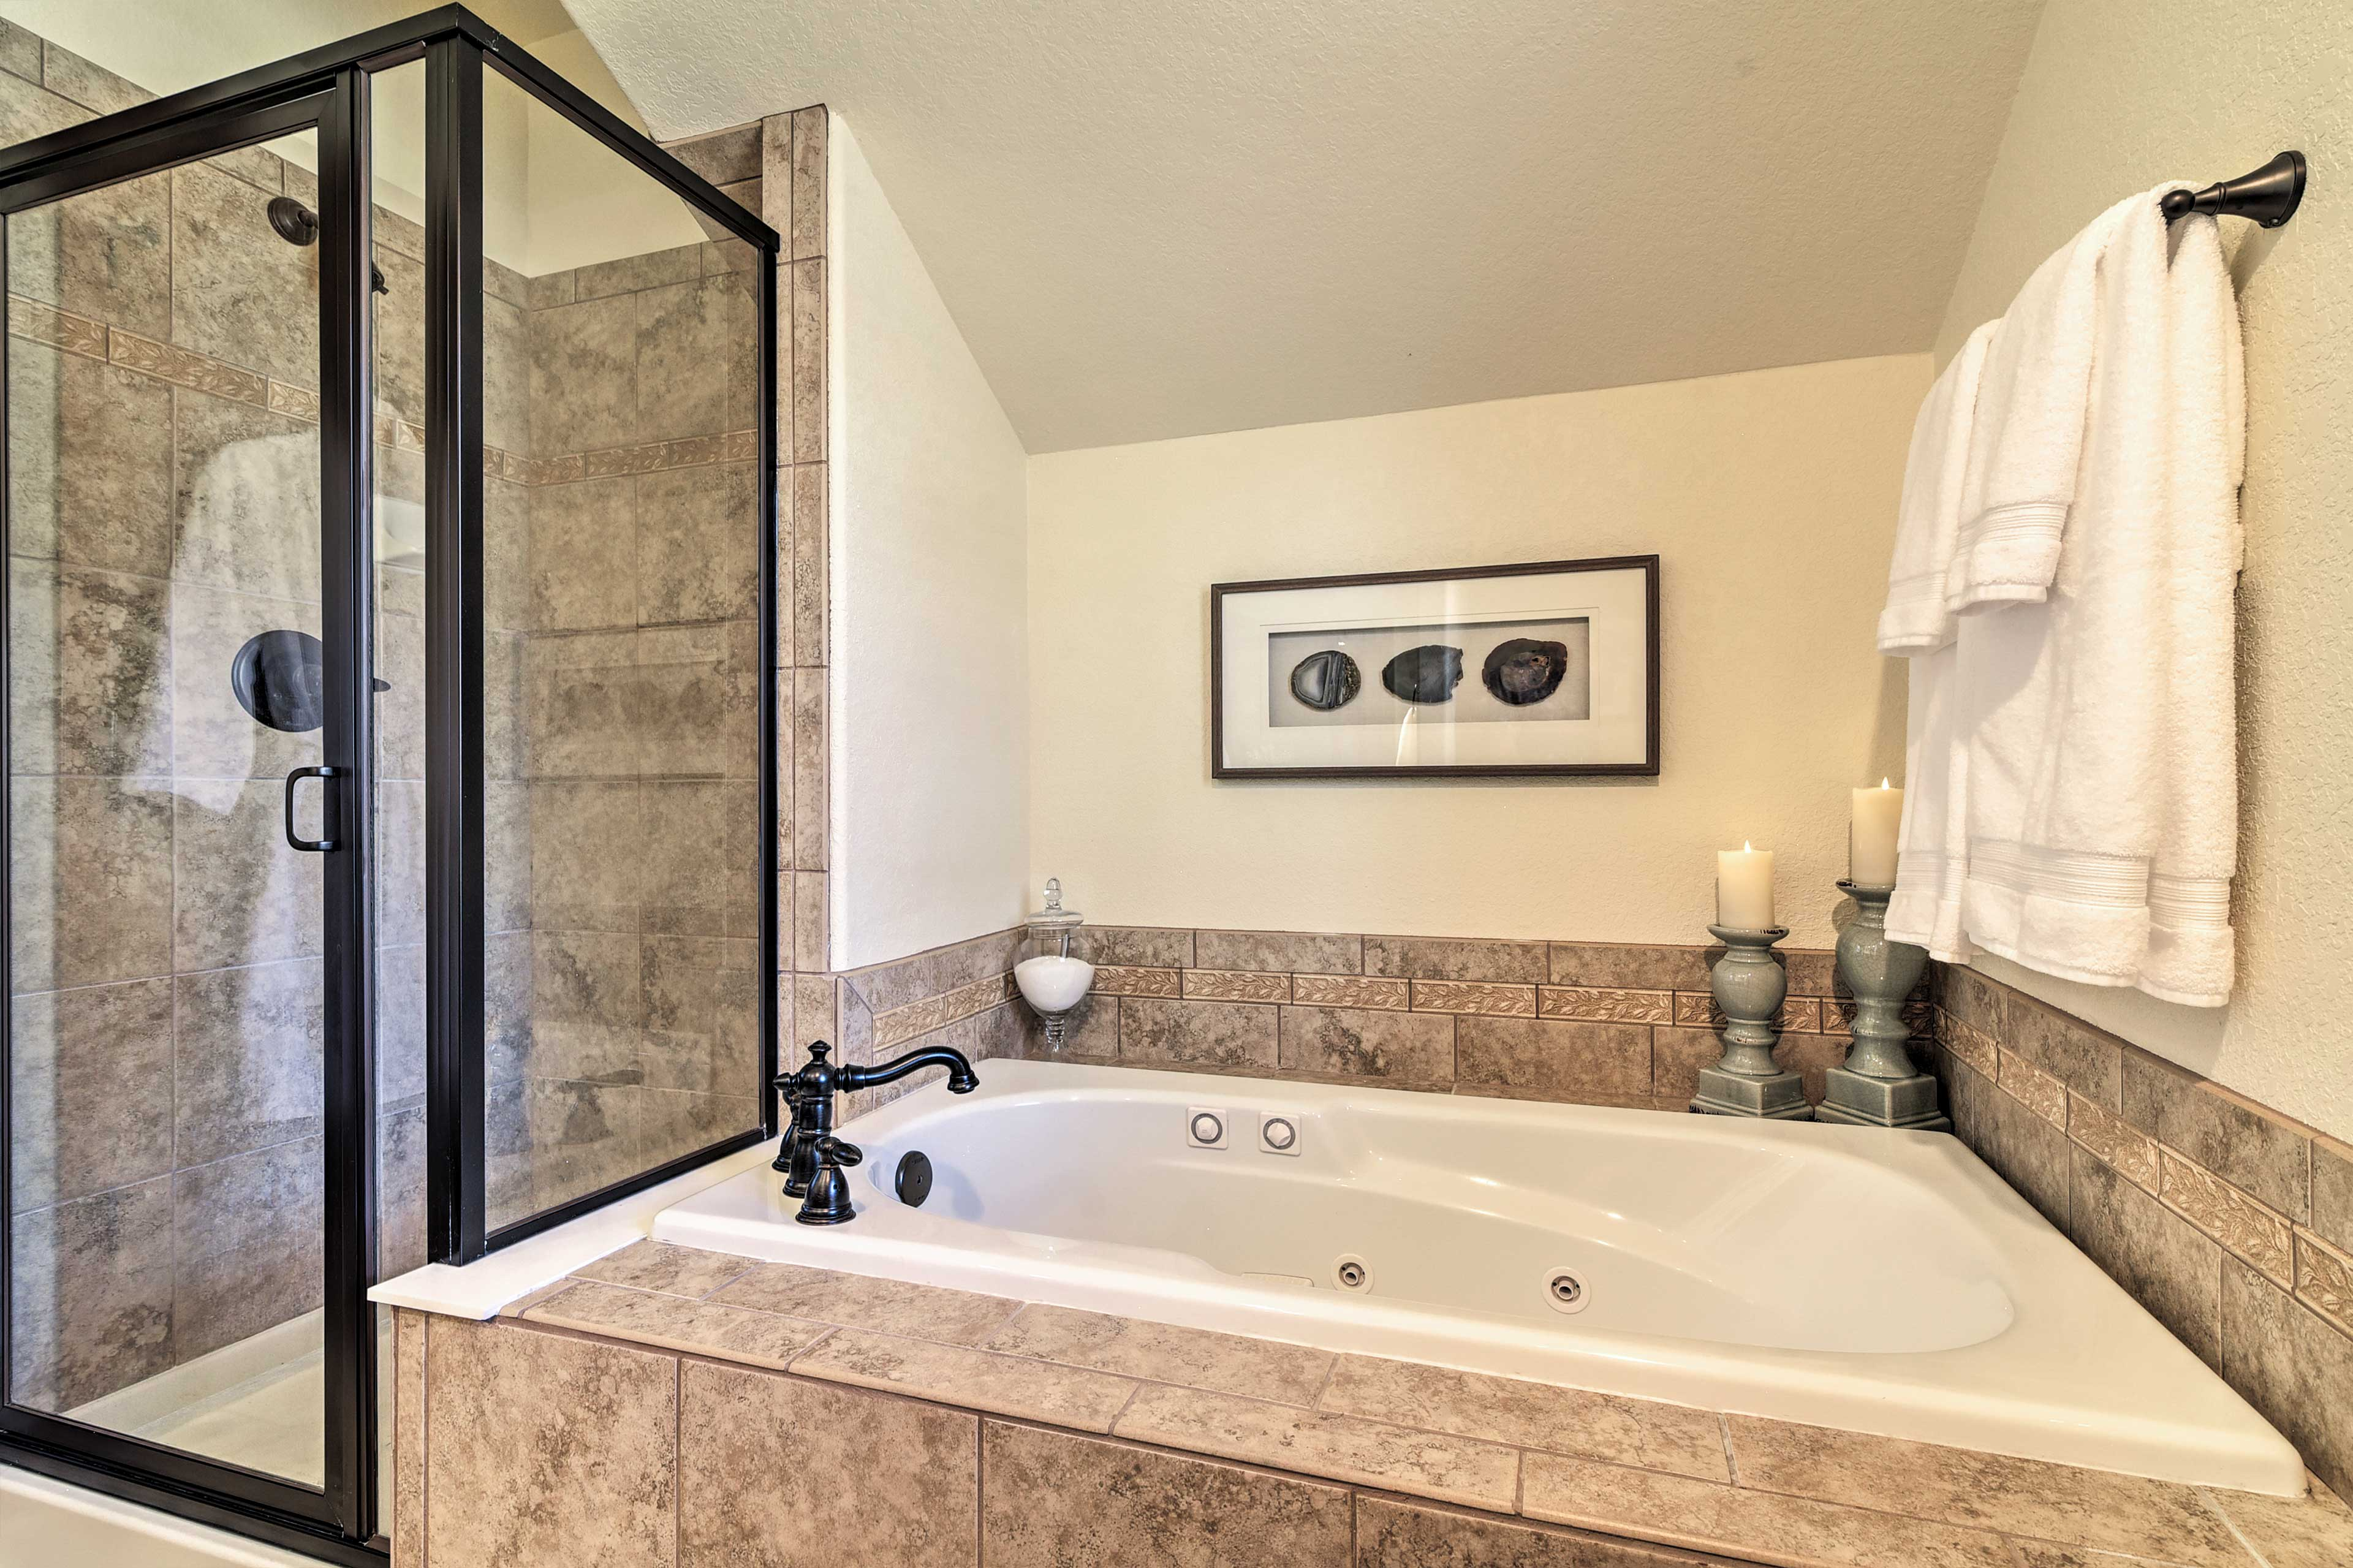 Decompress with a warm bath.